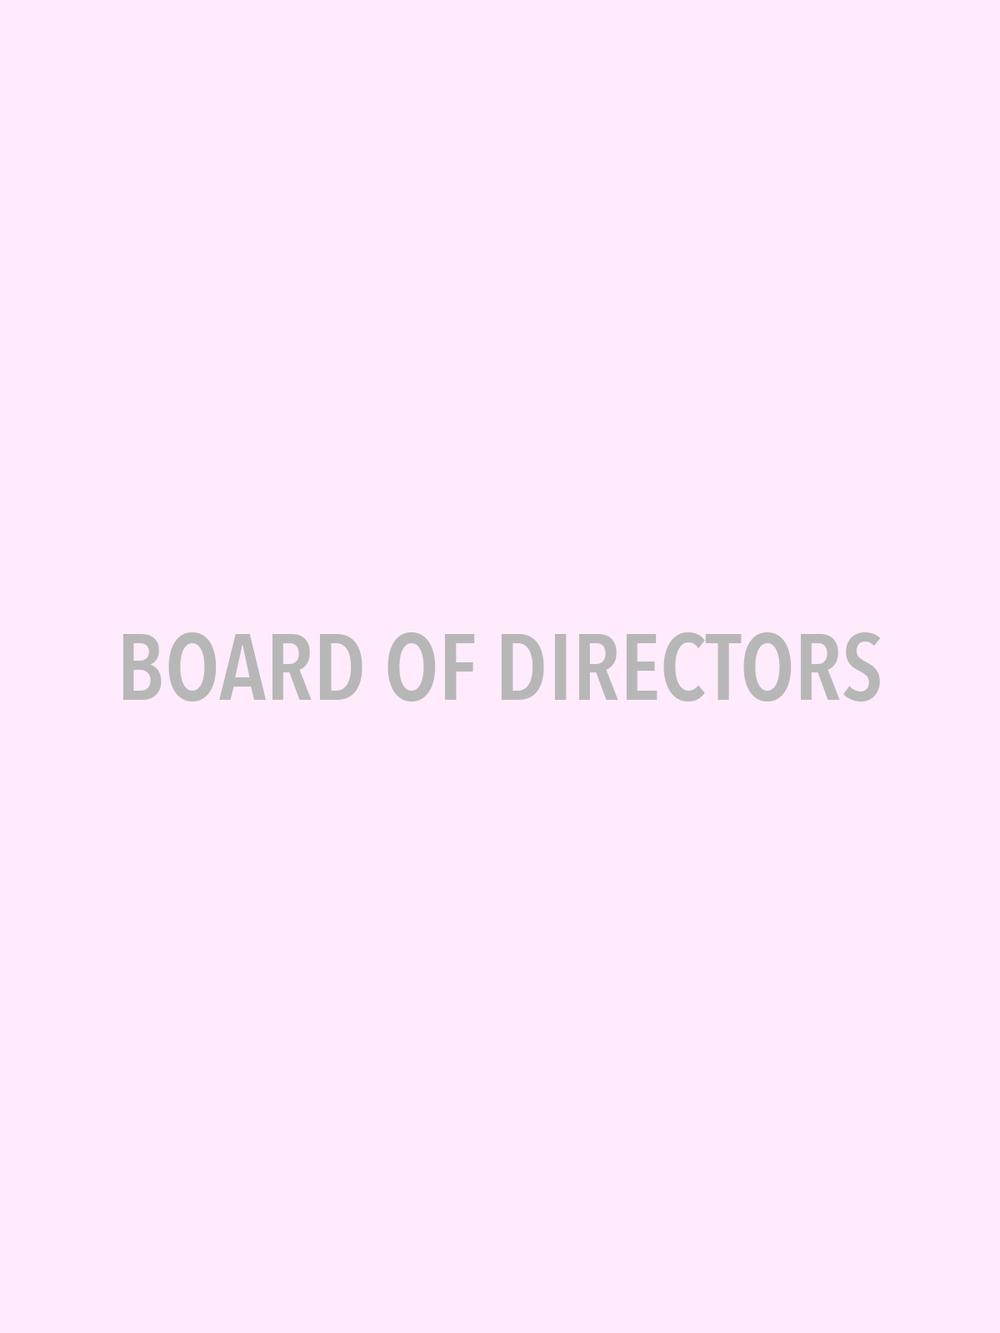 boardofdirector.jpg